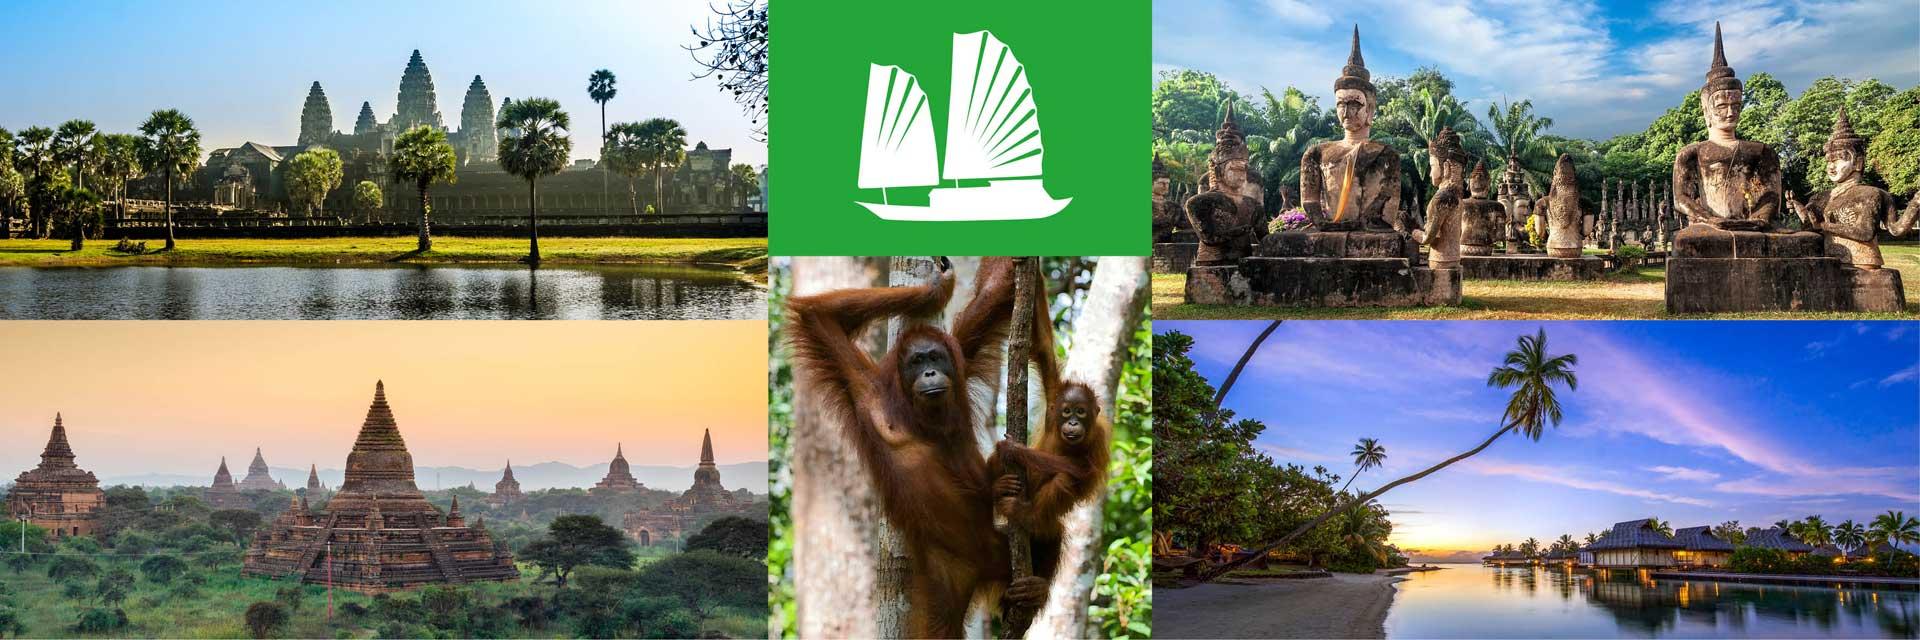 Bild Malaysia, Myanmar, Thailand, Indonesien (Bali), Kambodscha (Laos)